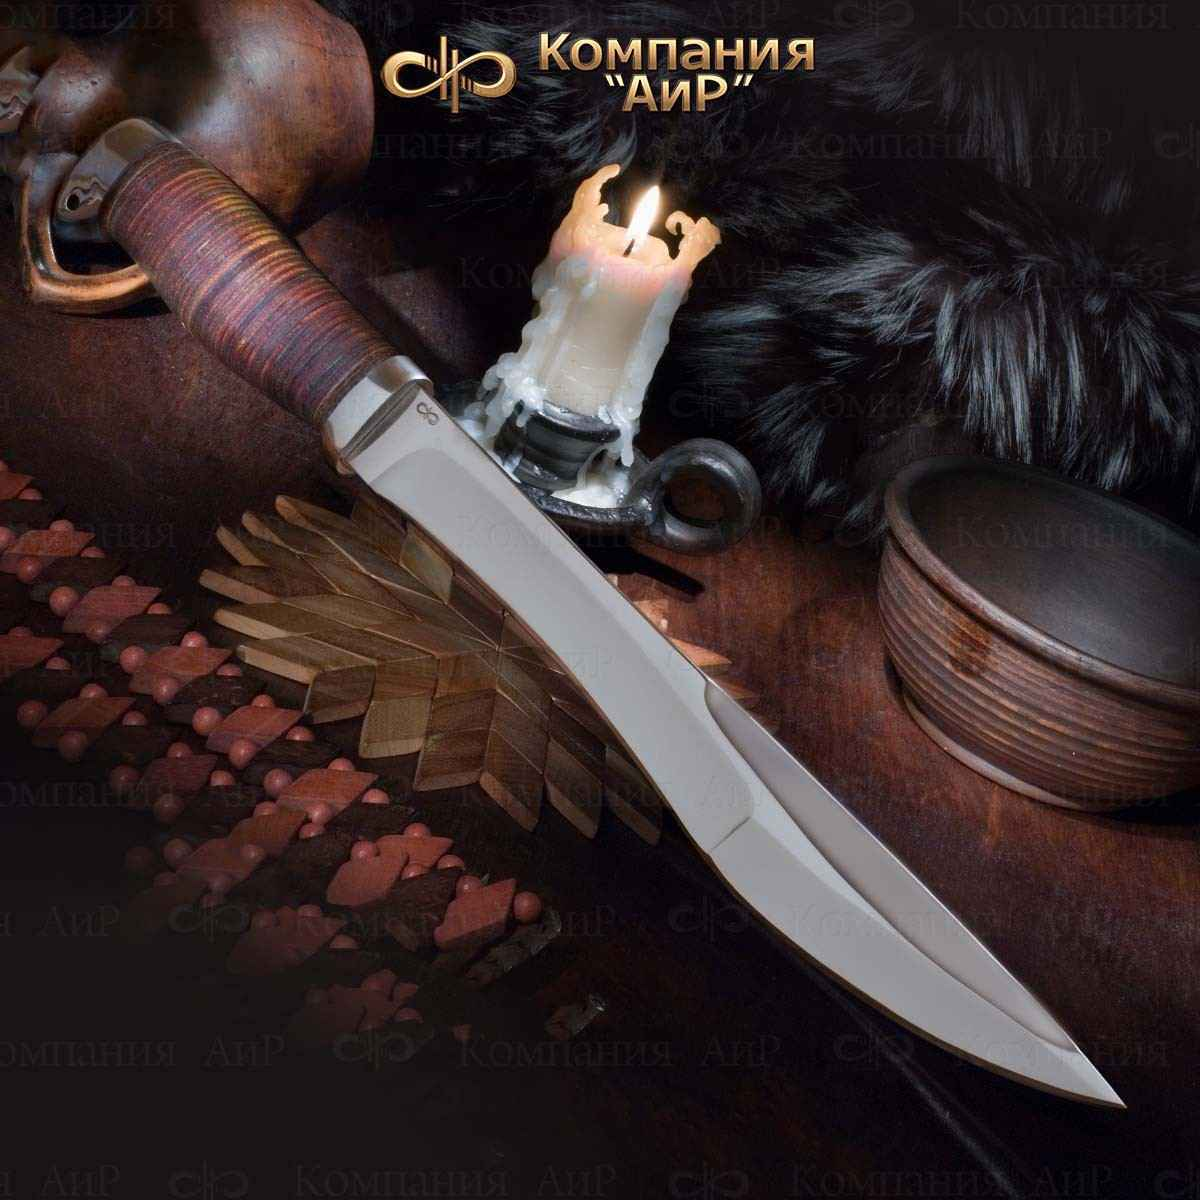 Мачете туристический (разделочный) АиР Боярин, сталь 100х13м, рукоять кожа